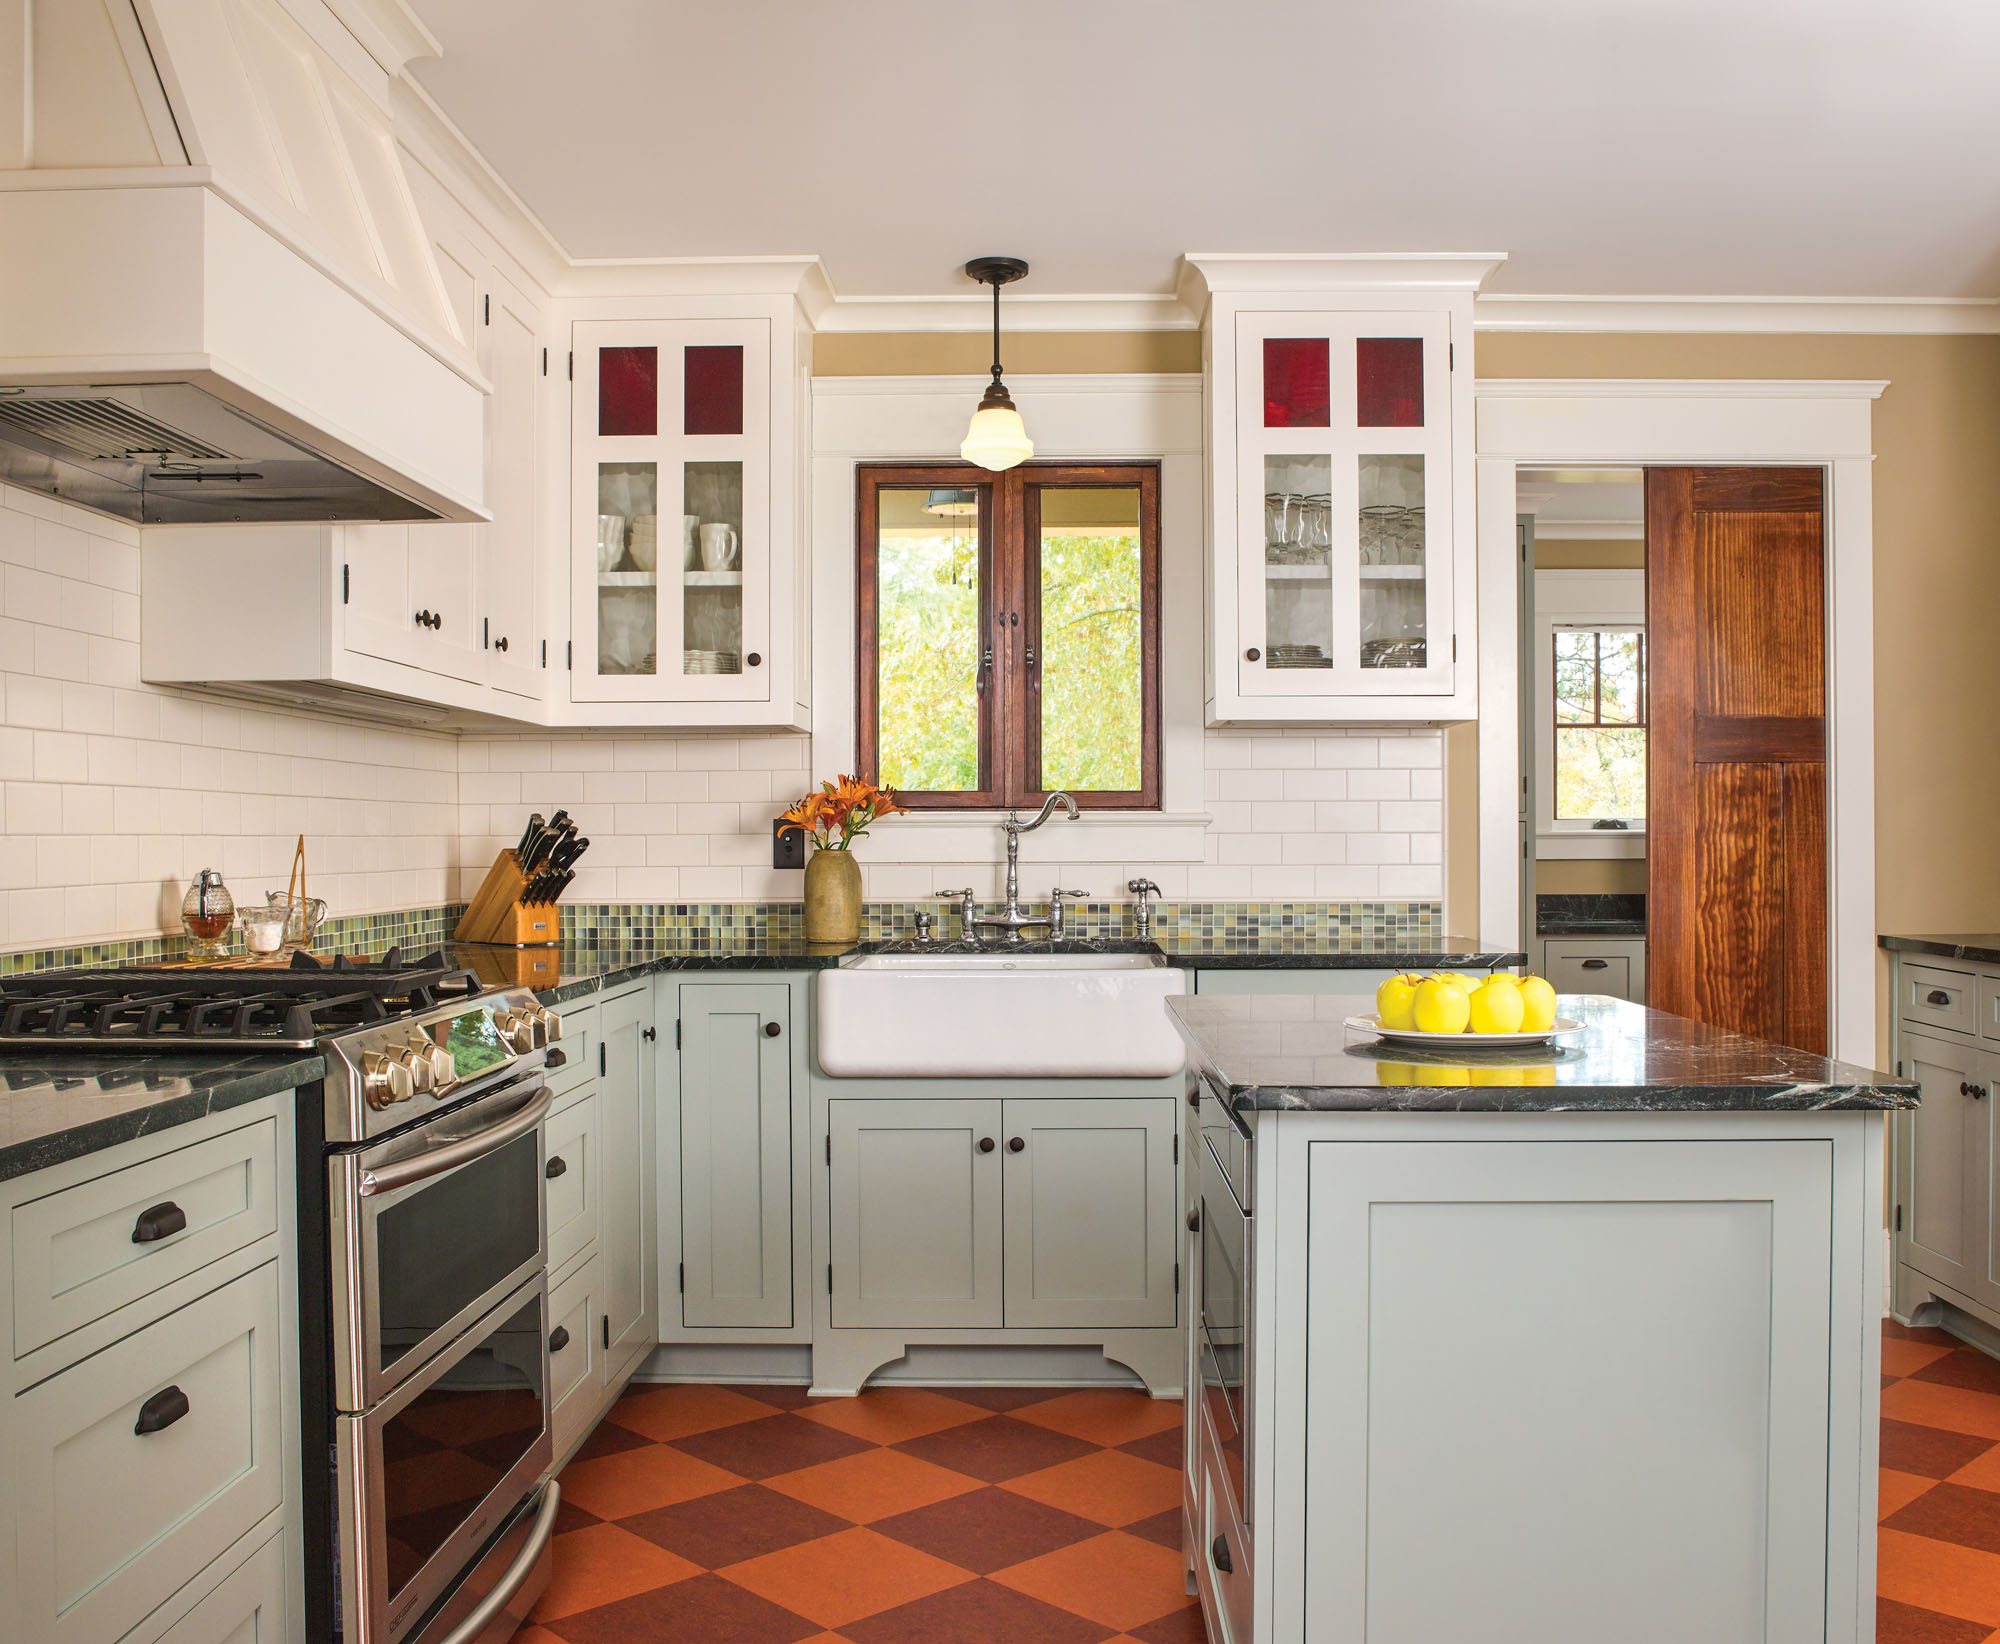 soapstone countertops, Marmoleum flooring, Craftsman kitchen